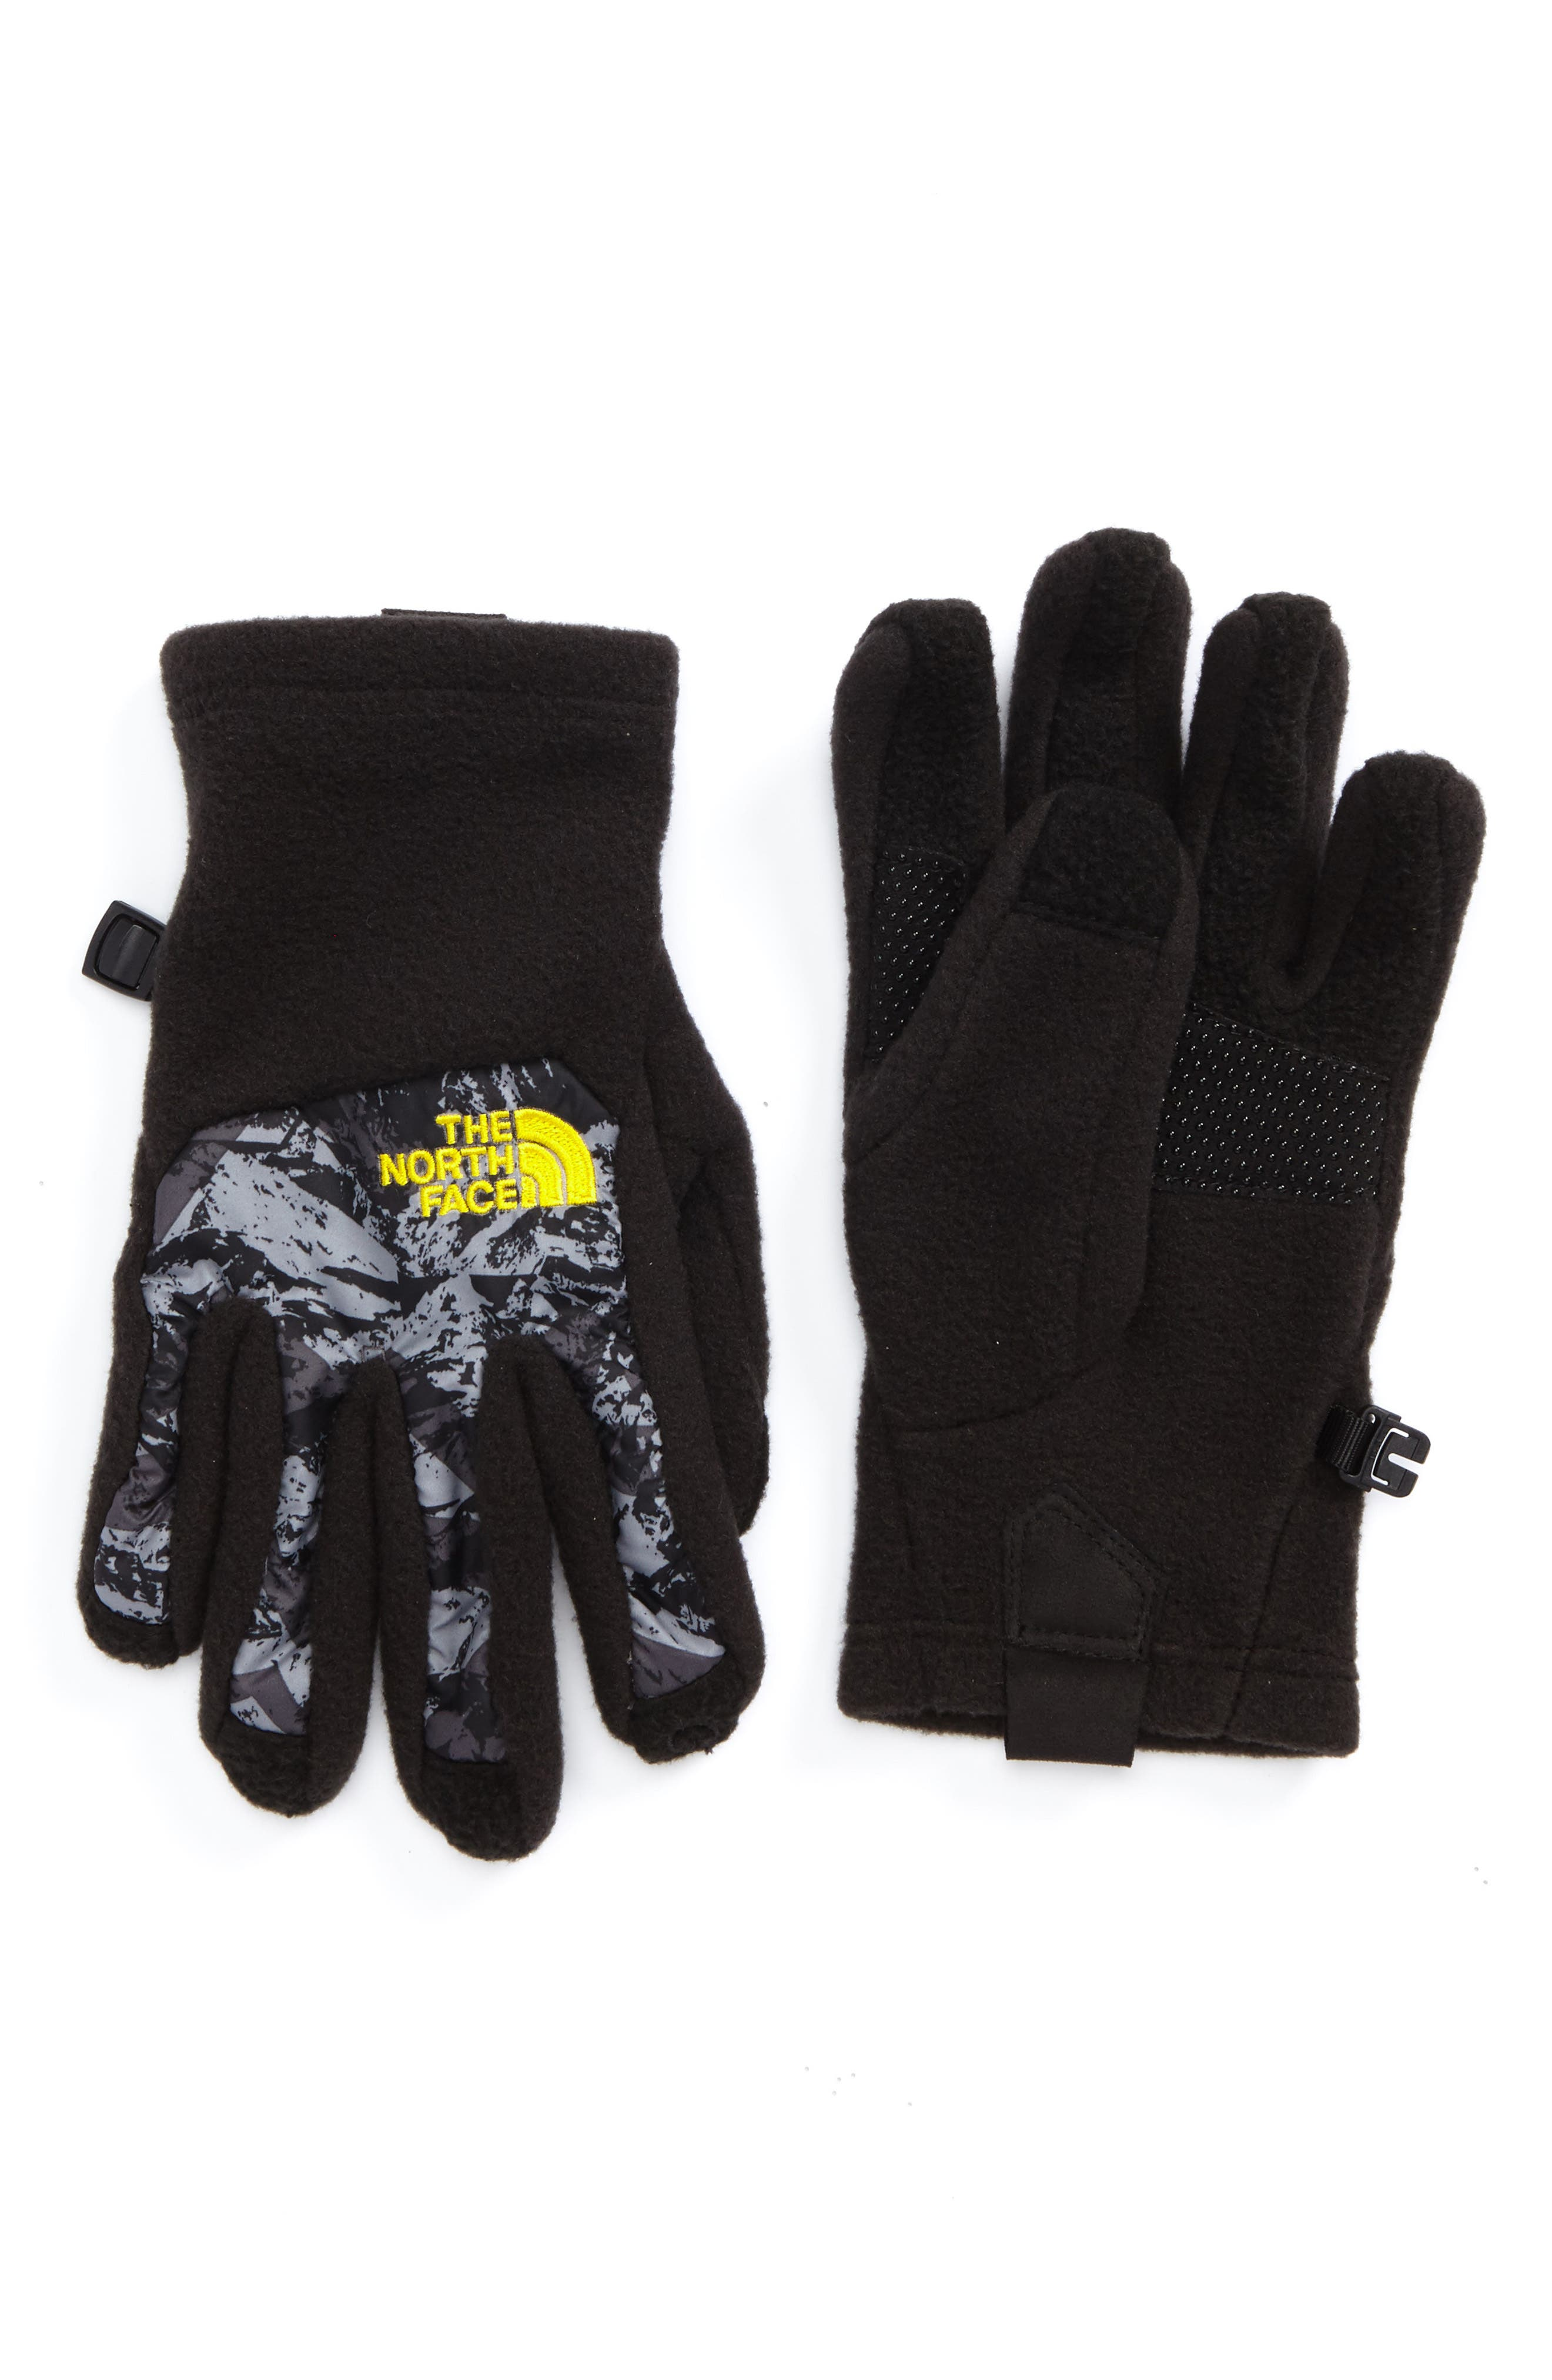 The North Face Denali Etip™ Gloves (Kids)